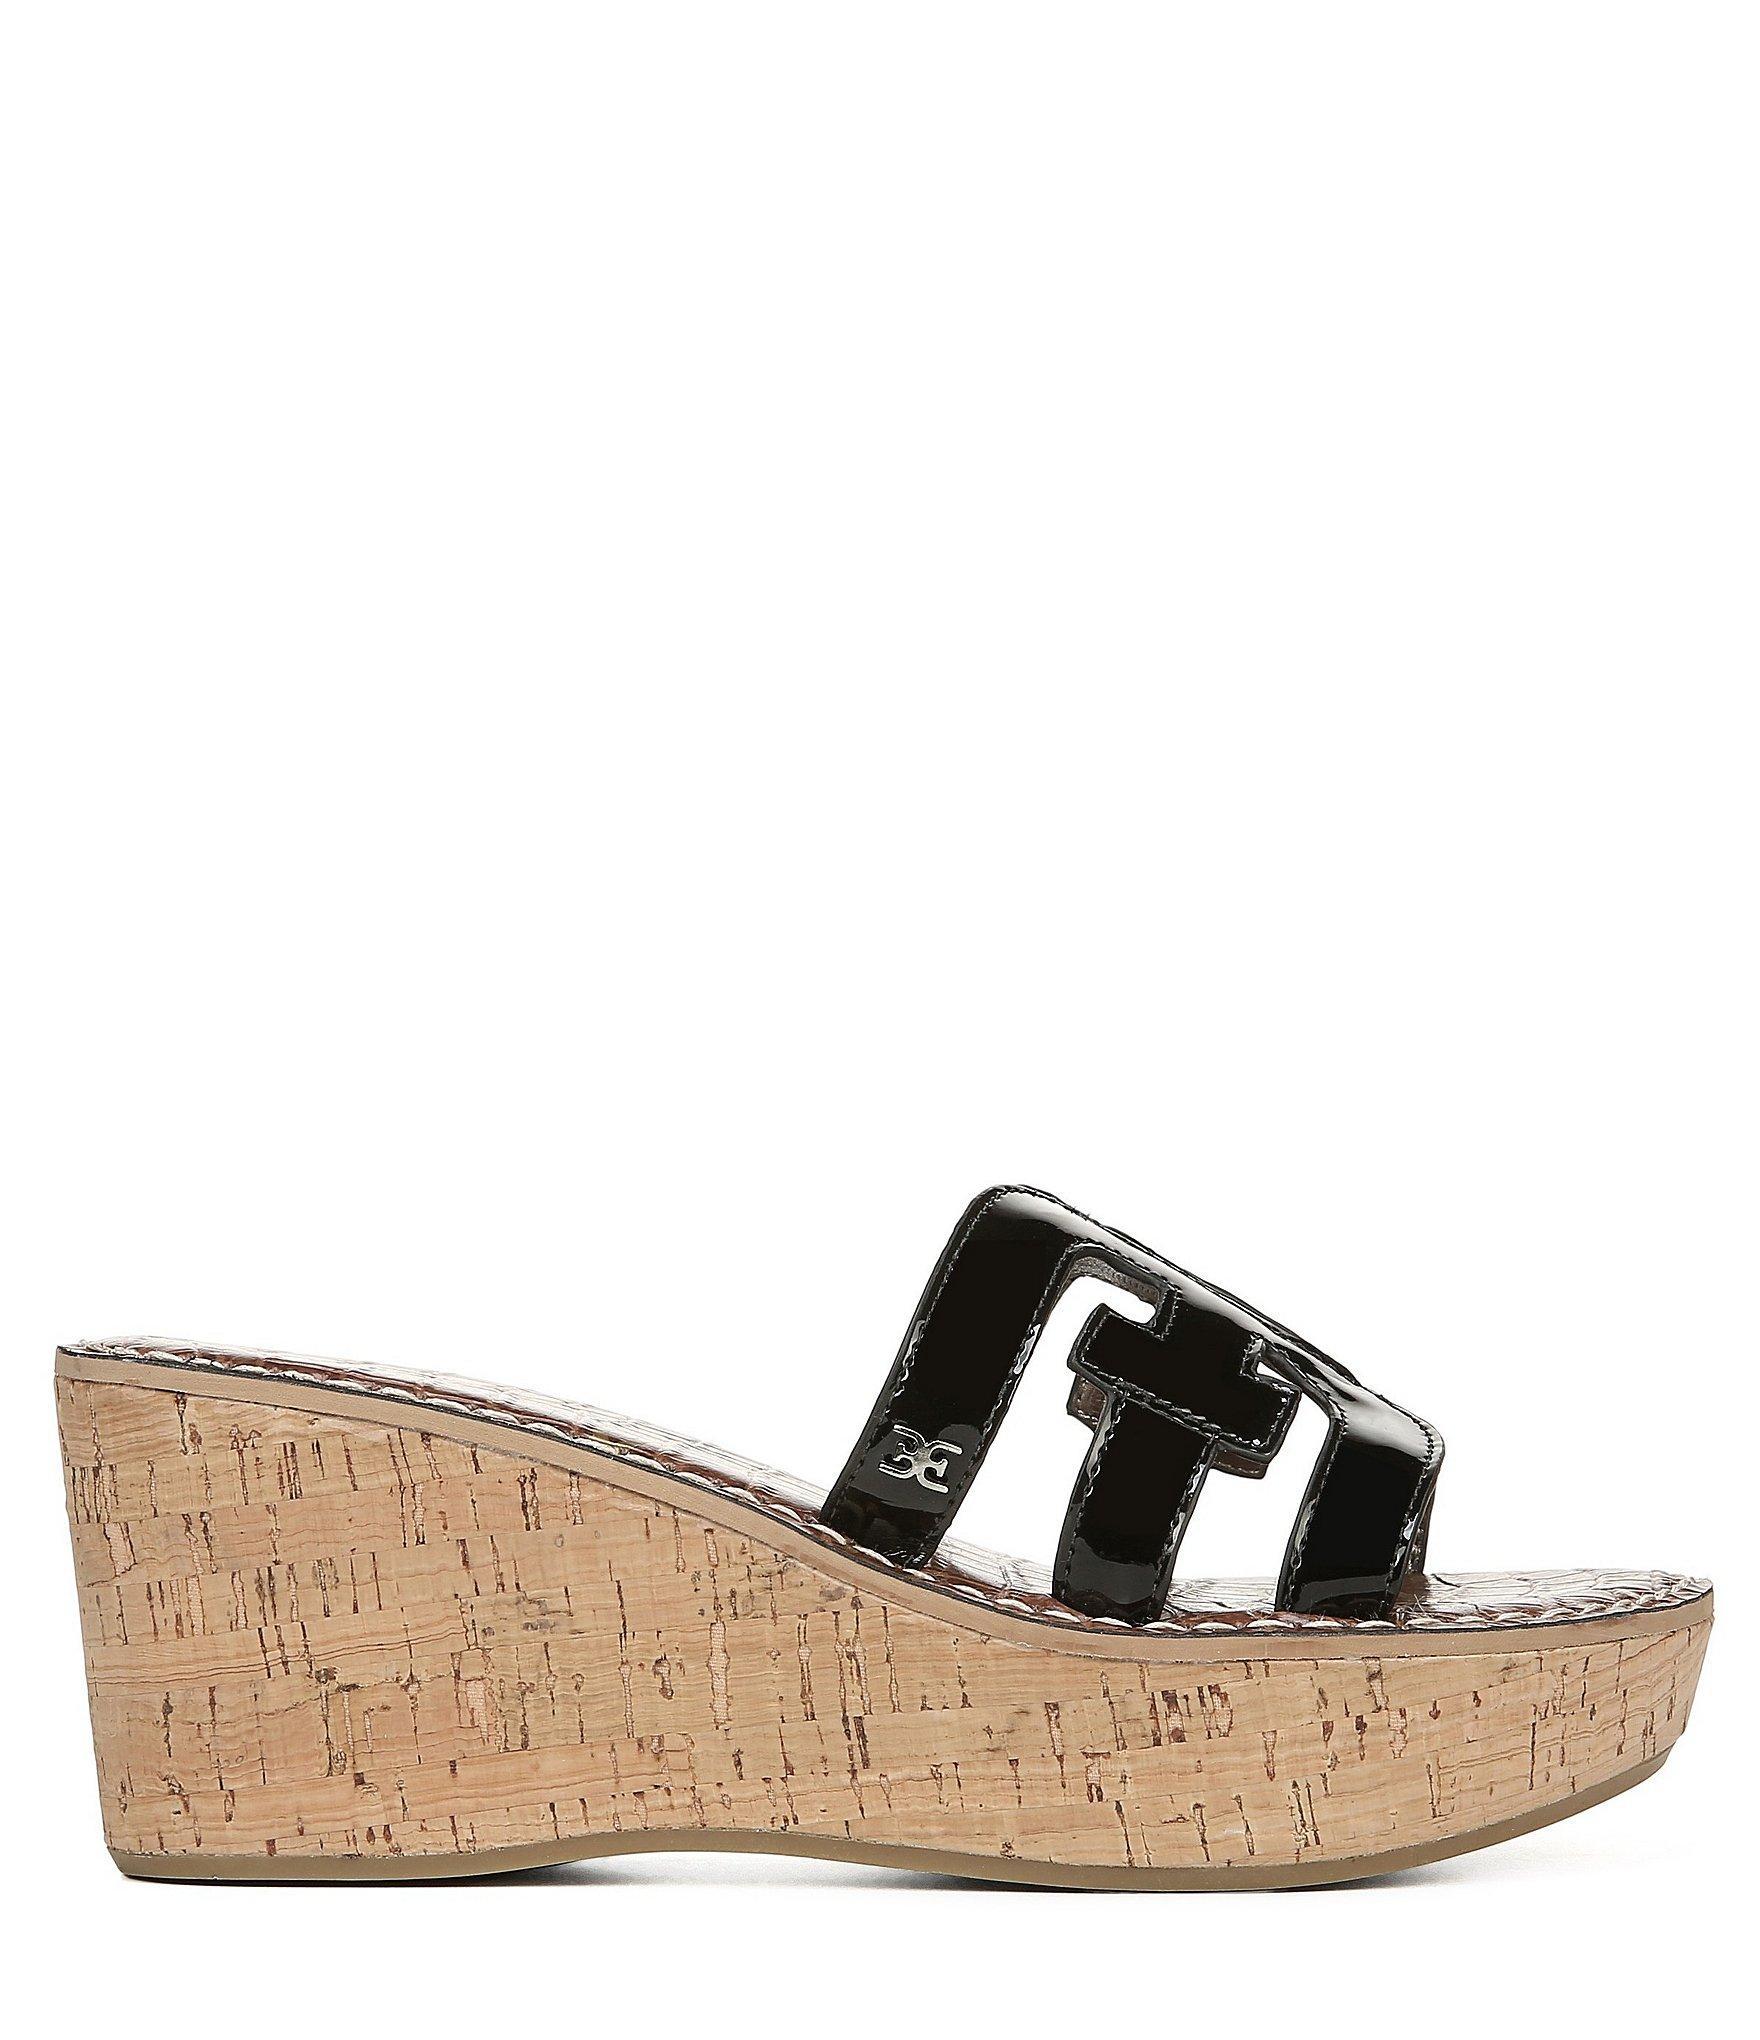 ba2fc99dda3d26 Lyst - Sam Edelman Regis Patent Cork Wedge Sandals in Black - Save 1%